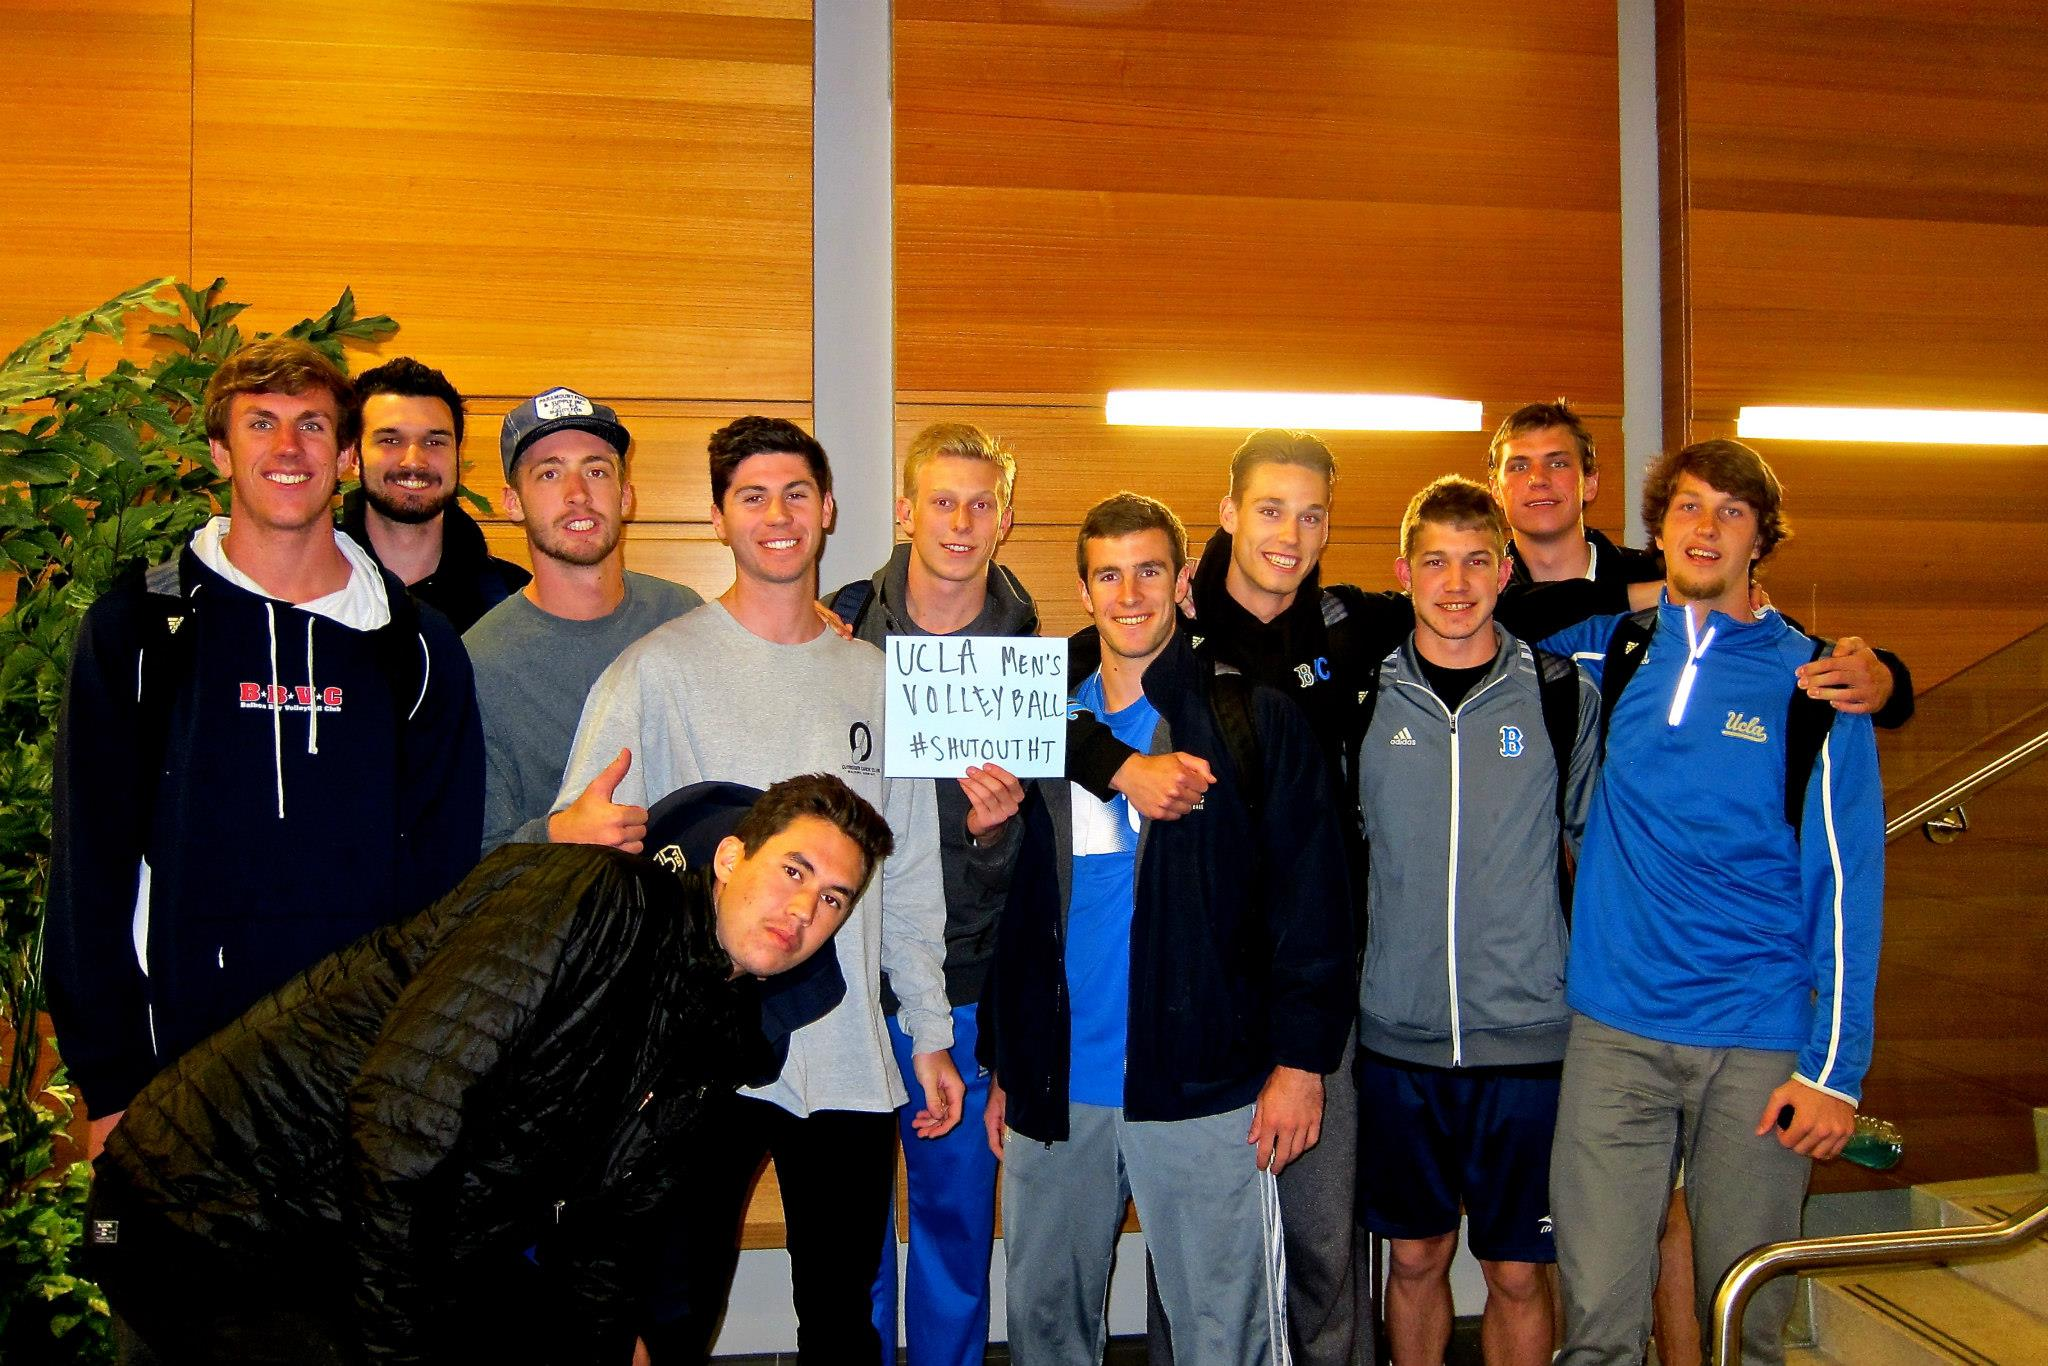 UCLA Men's Volleyball participates in the #ShutOutHT photo campaign. Photo credit: Esha Jalota